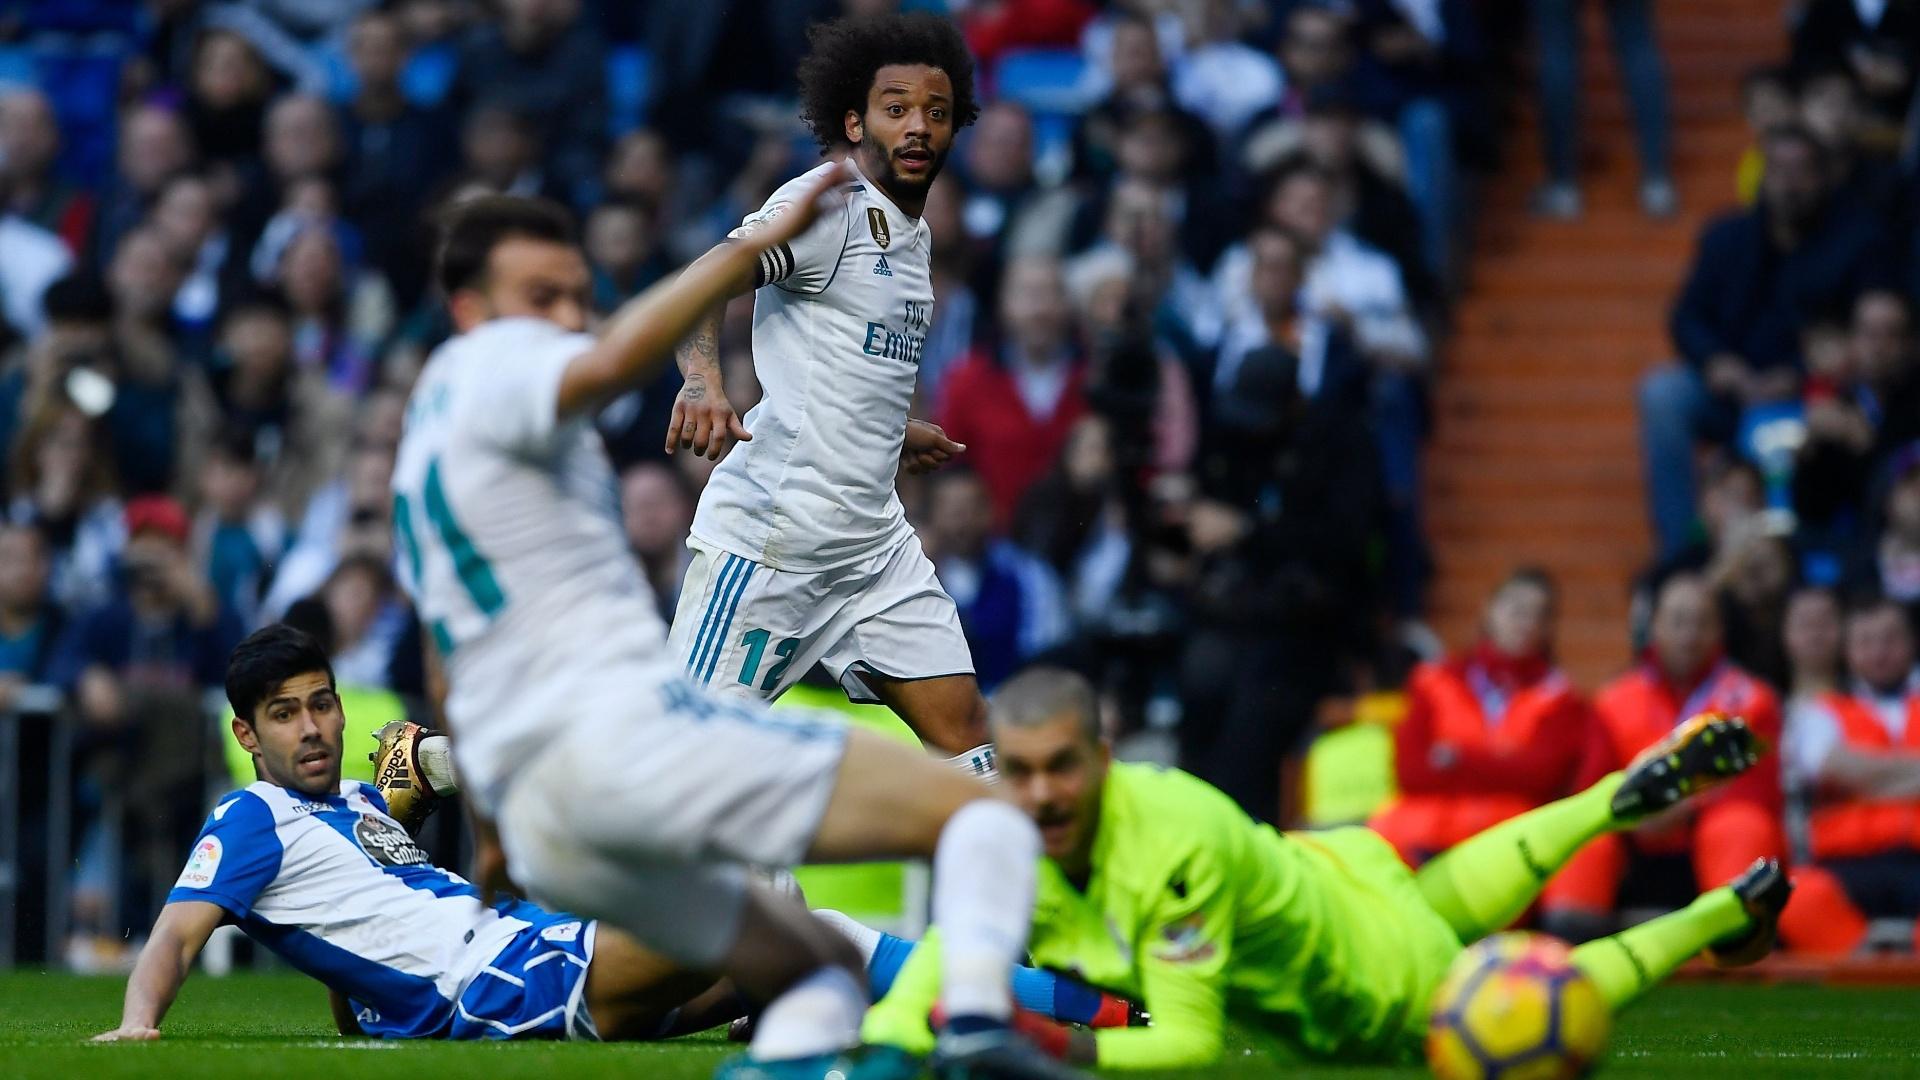 Marcelo tenta cruzamento durante a partida entre Real Madrid e Deportivo La Coruña